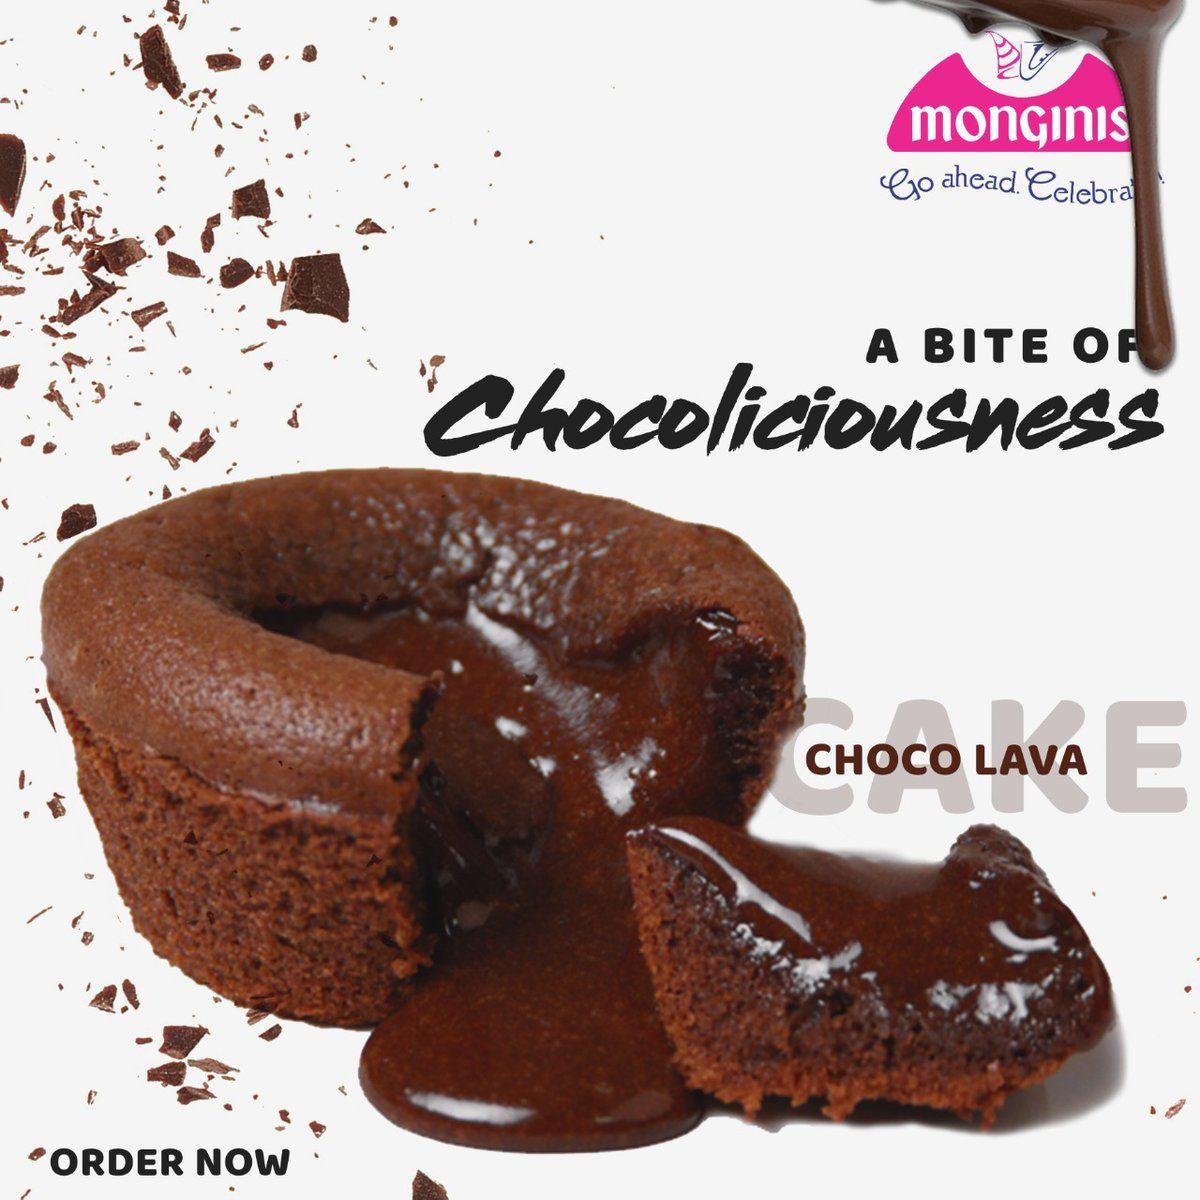 Monginis Cake Shop Chhattisgarh On Twitter Choco Lava Cake Shop Lava Cakes